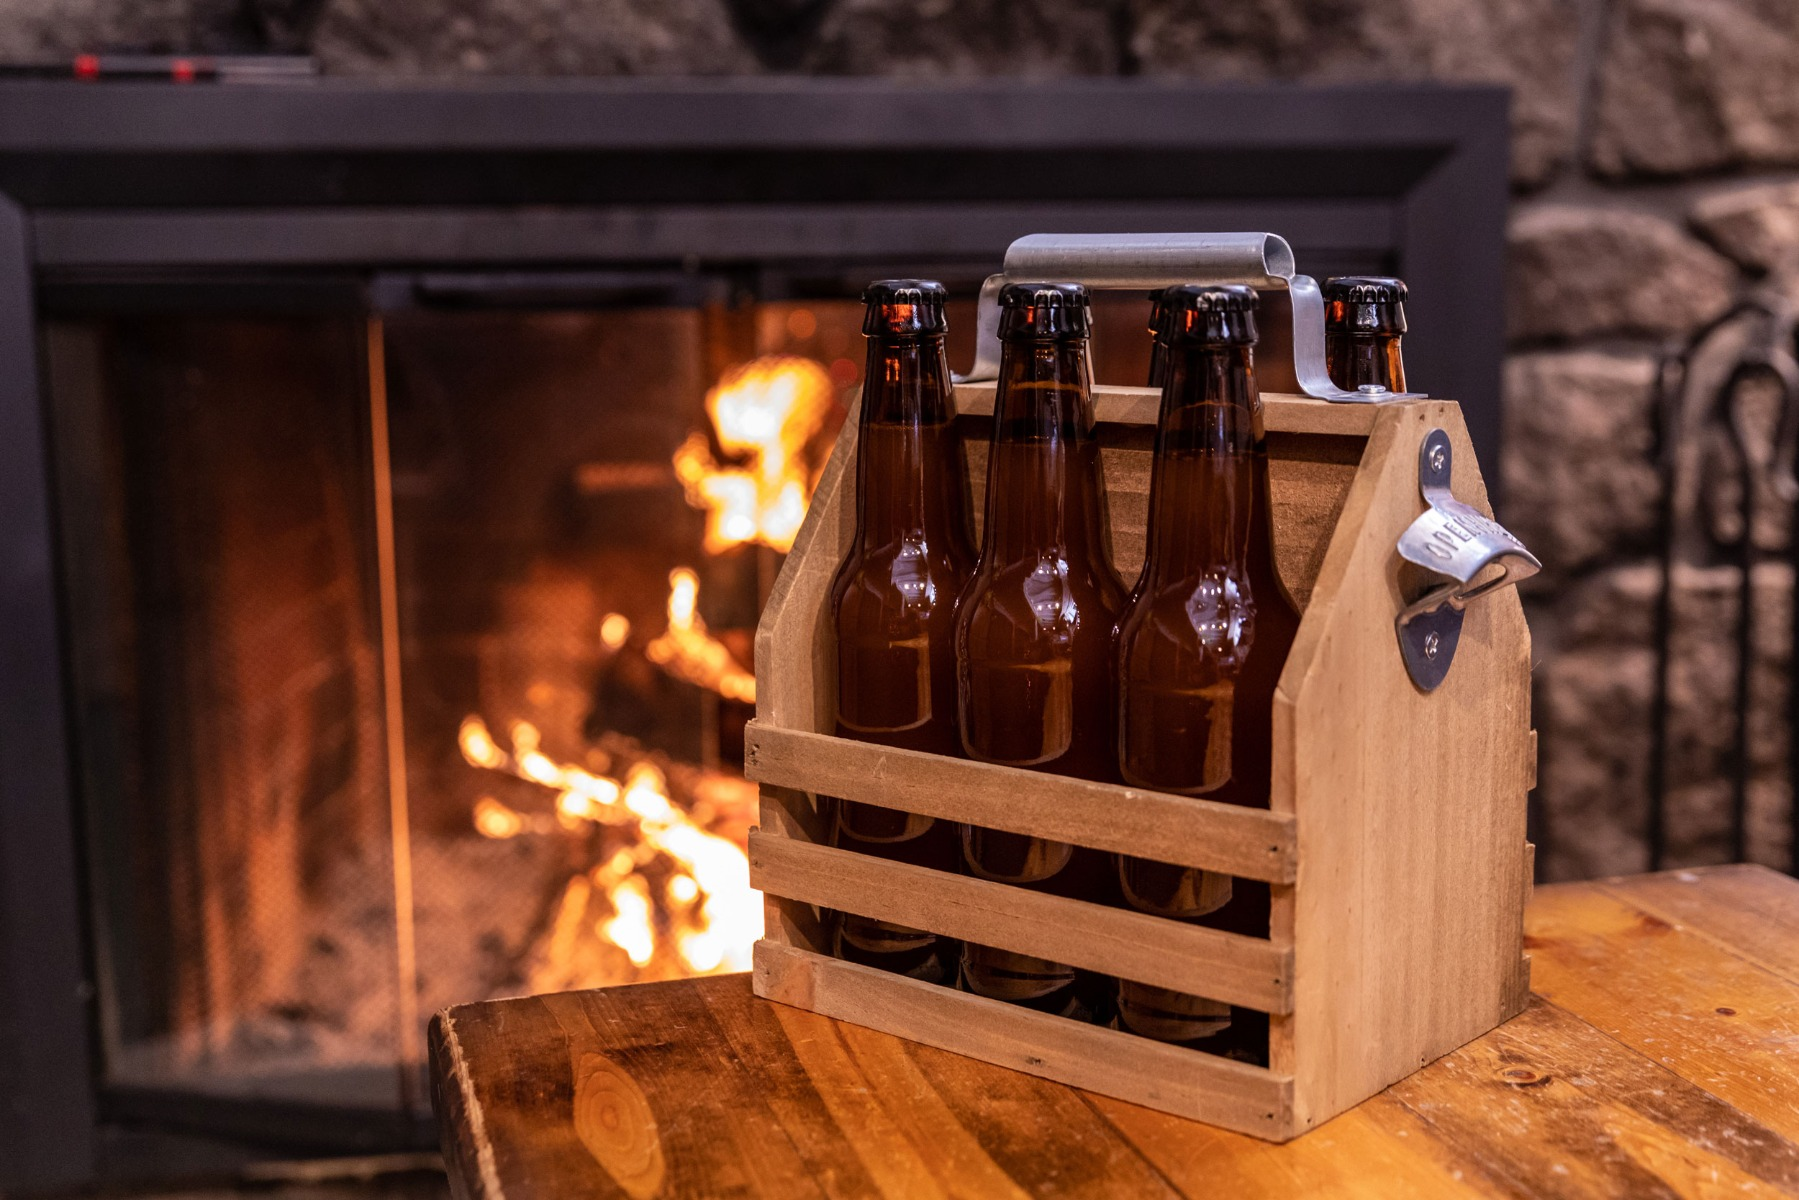 Prik en Tik - Streekbieren - Onze vijf sterkste bieren